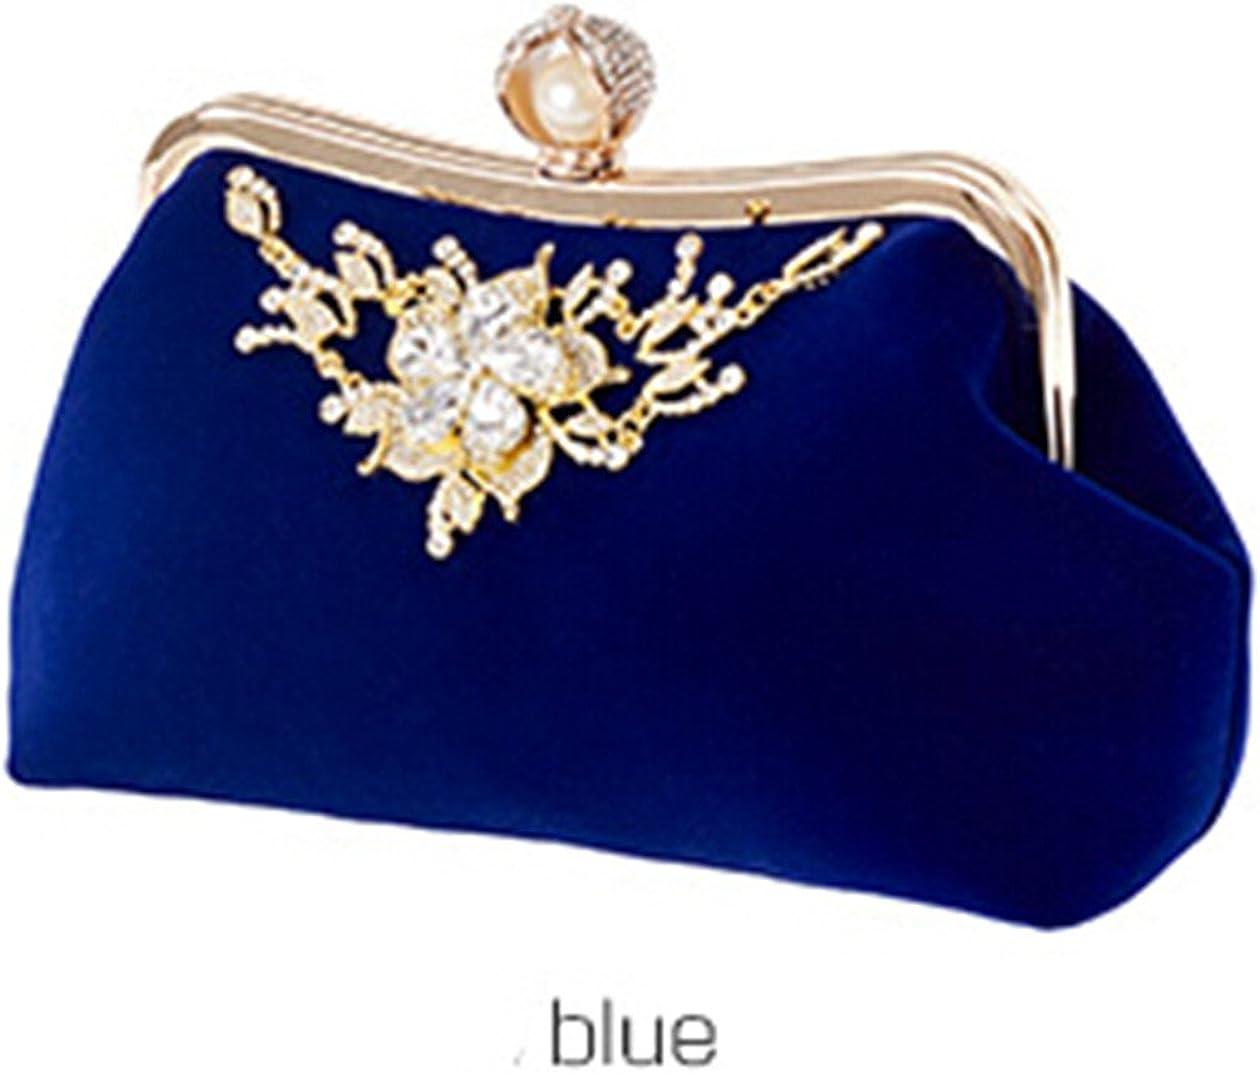 Crystal Flower Design Evening Bag Wedding Party Bride Clutch Velour Bag Purse